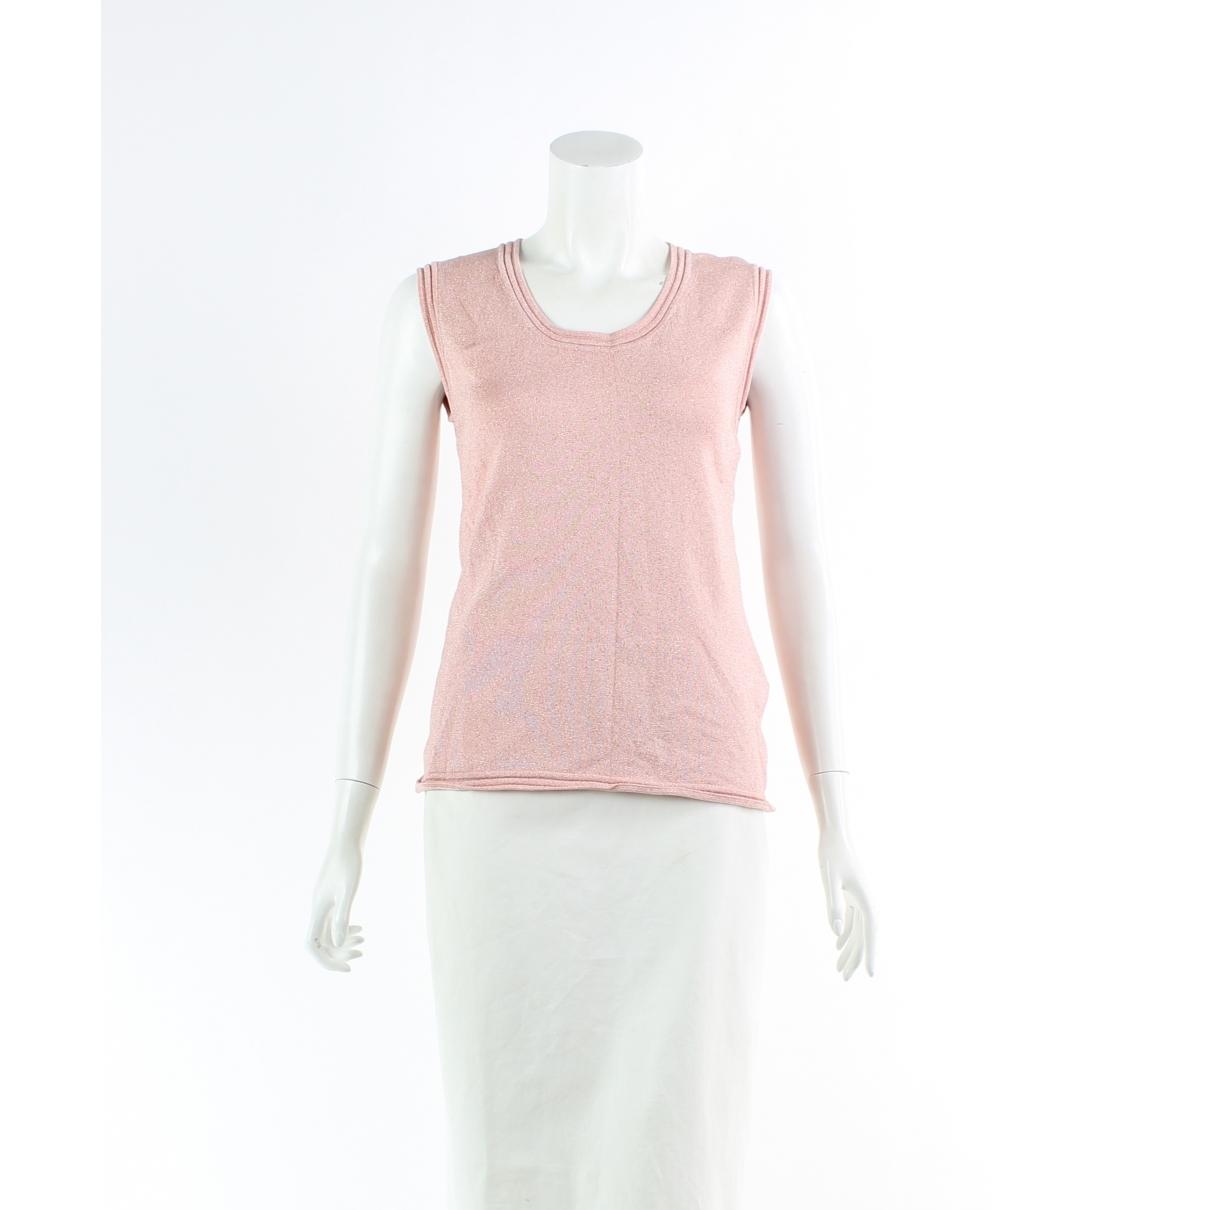 M Missoni \N Pink  top for Women 44 FR